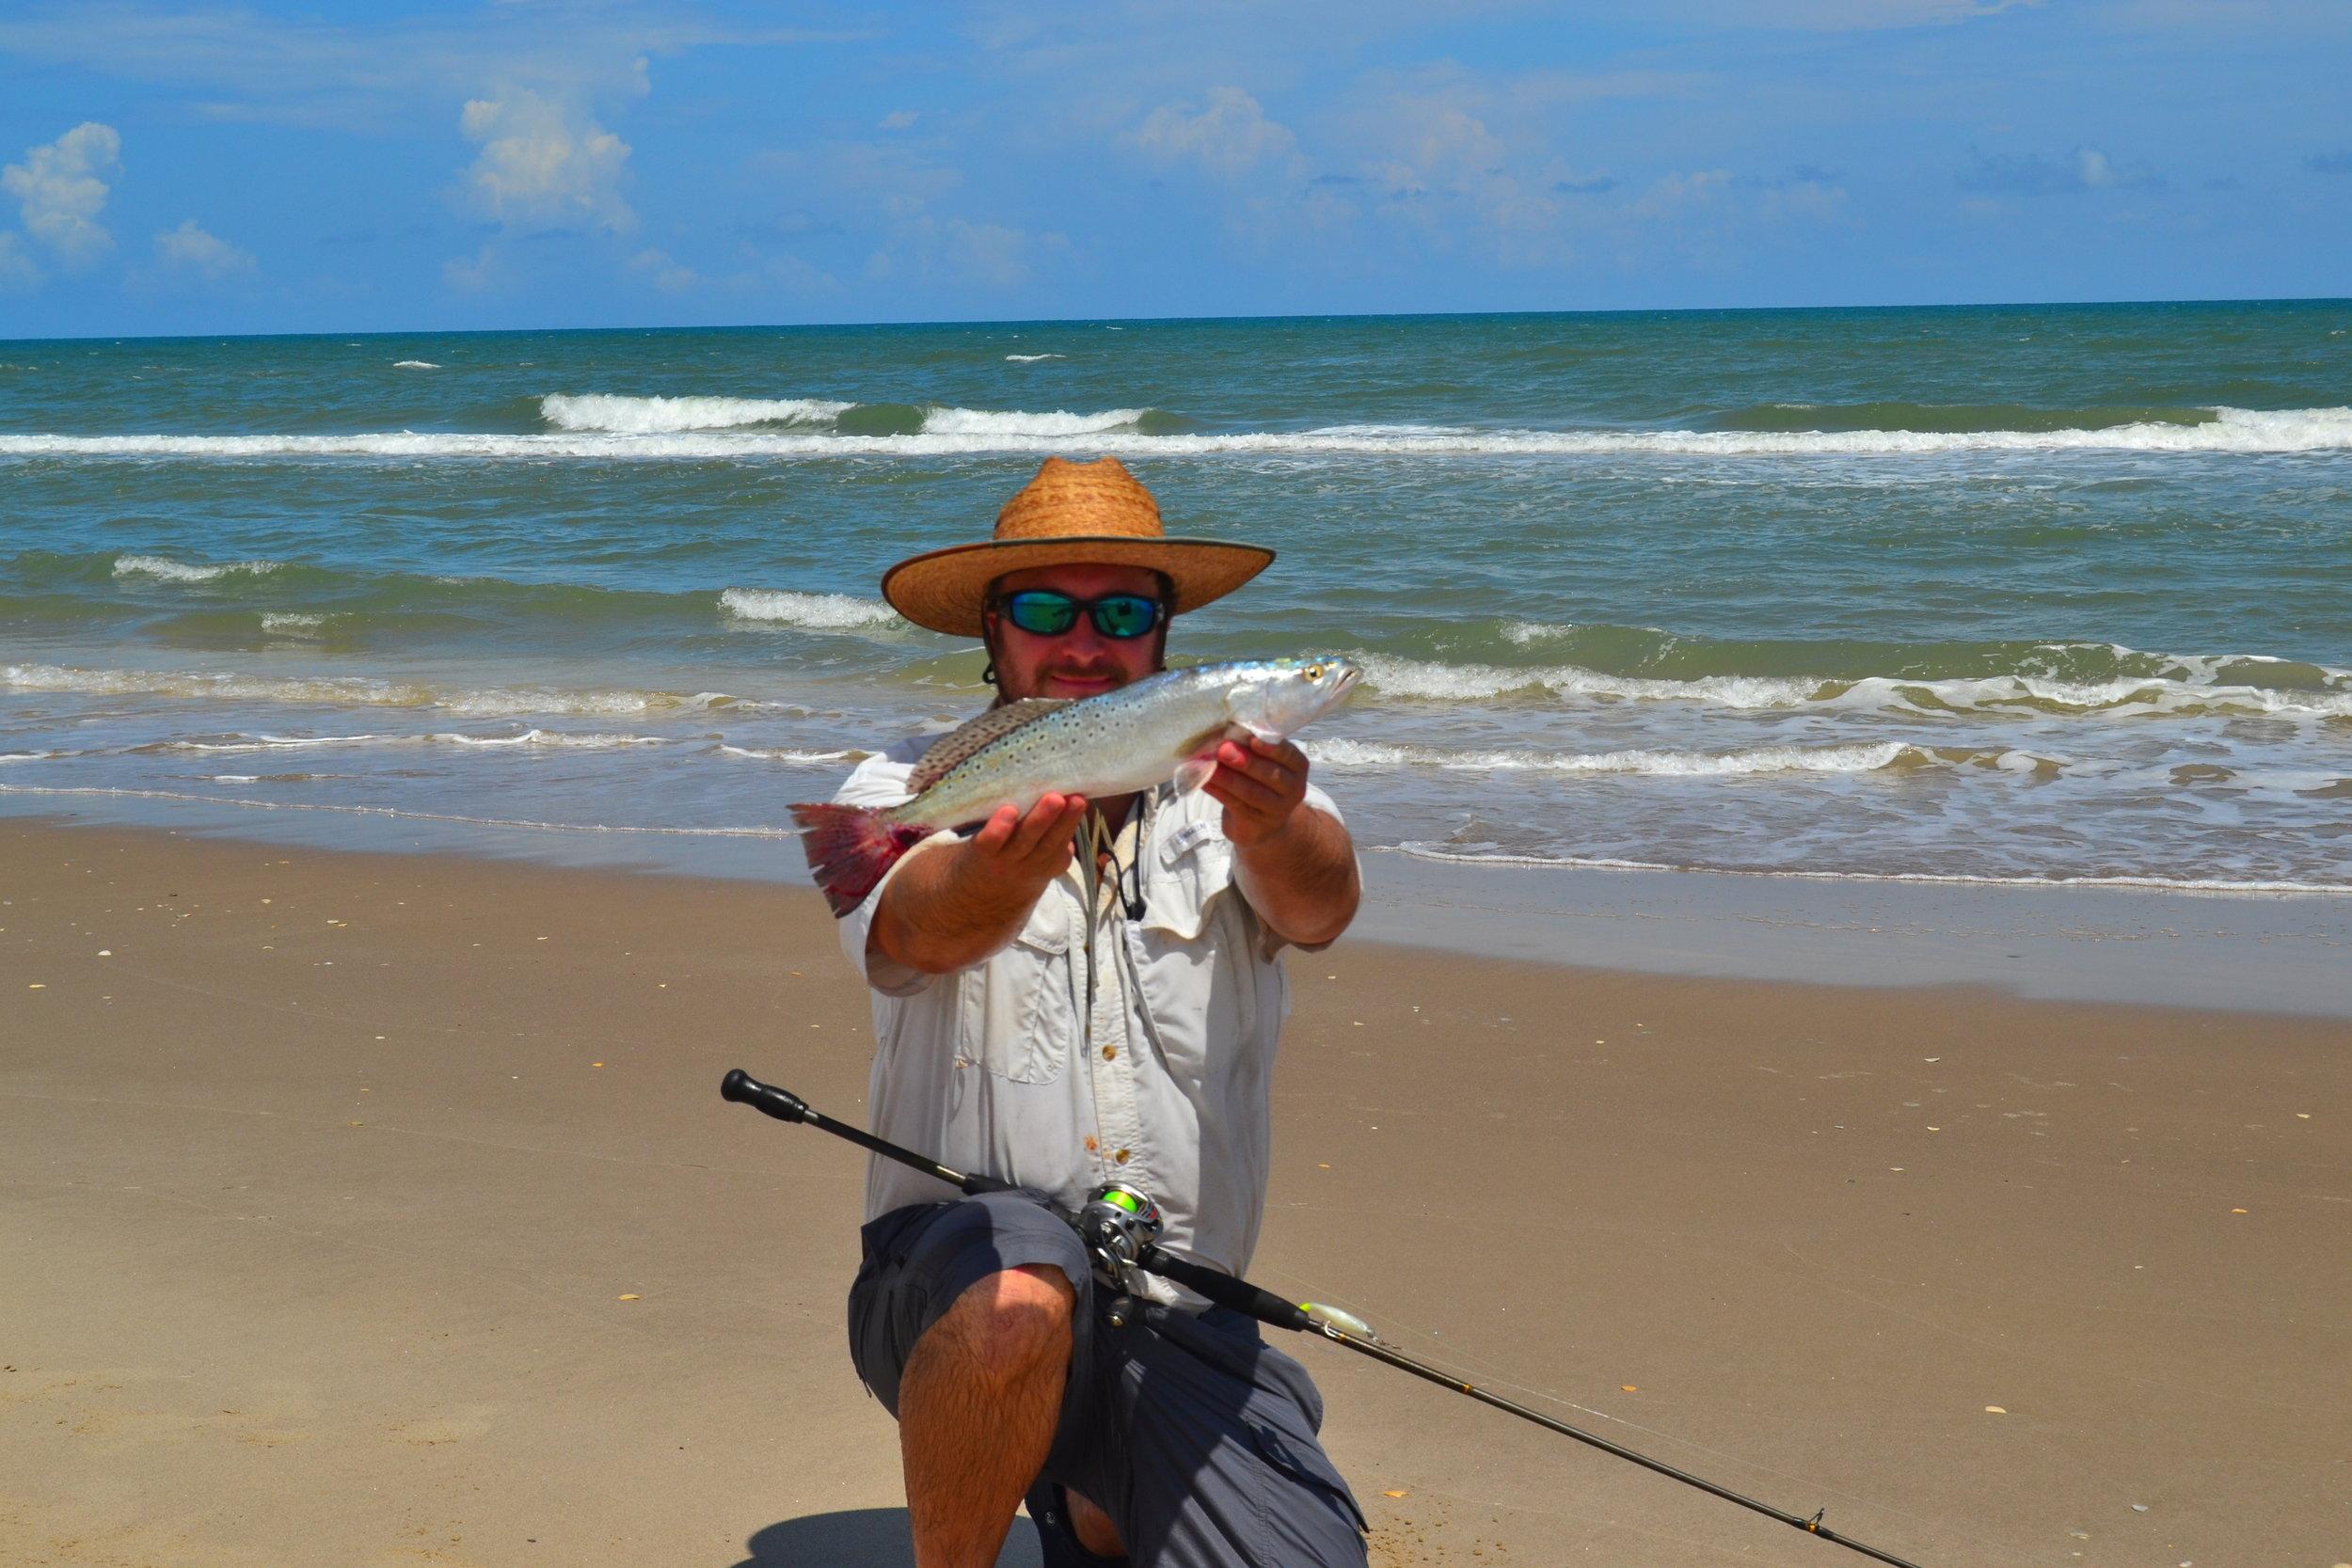 July surf trout on plastics